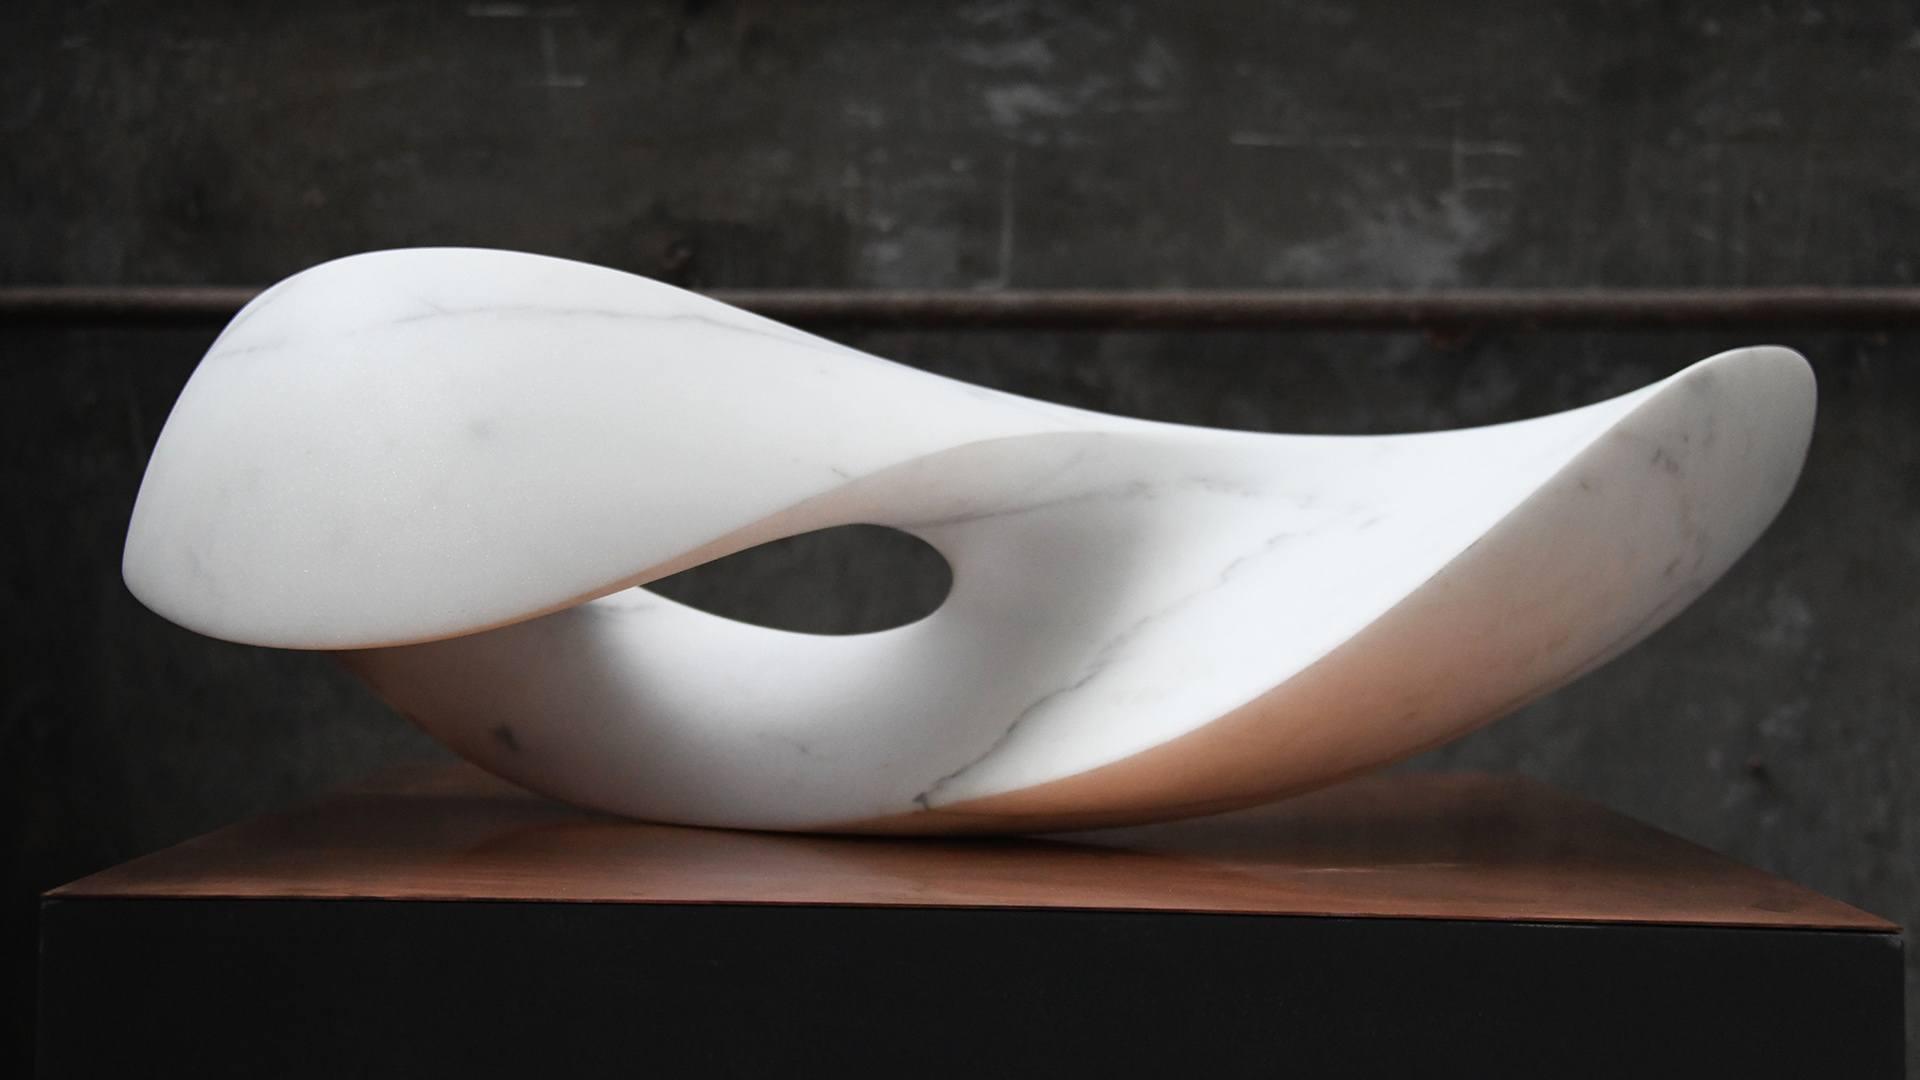 Barbara Schnetzler sculpter la vie : oeuvre en marbre